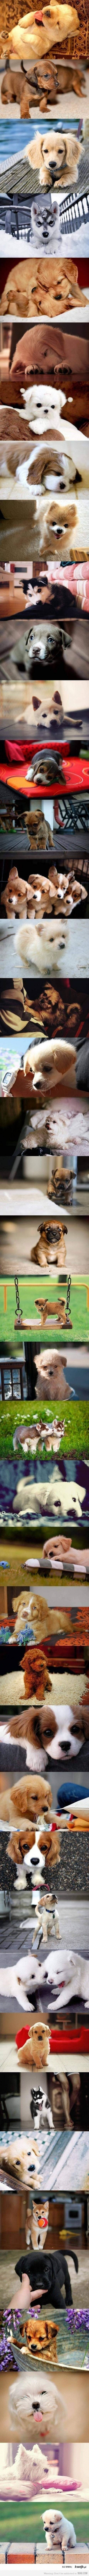 I want a puppy, please  @Tanya Rankine